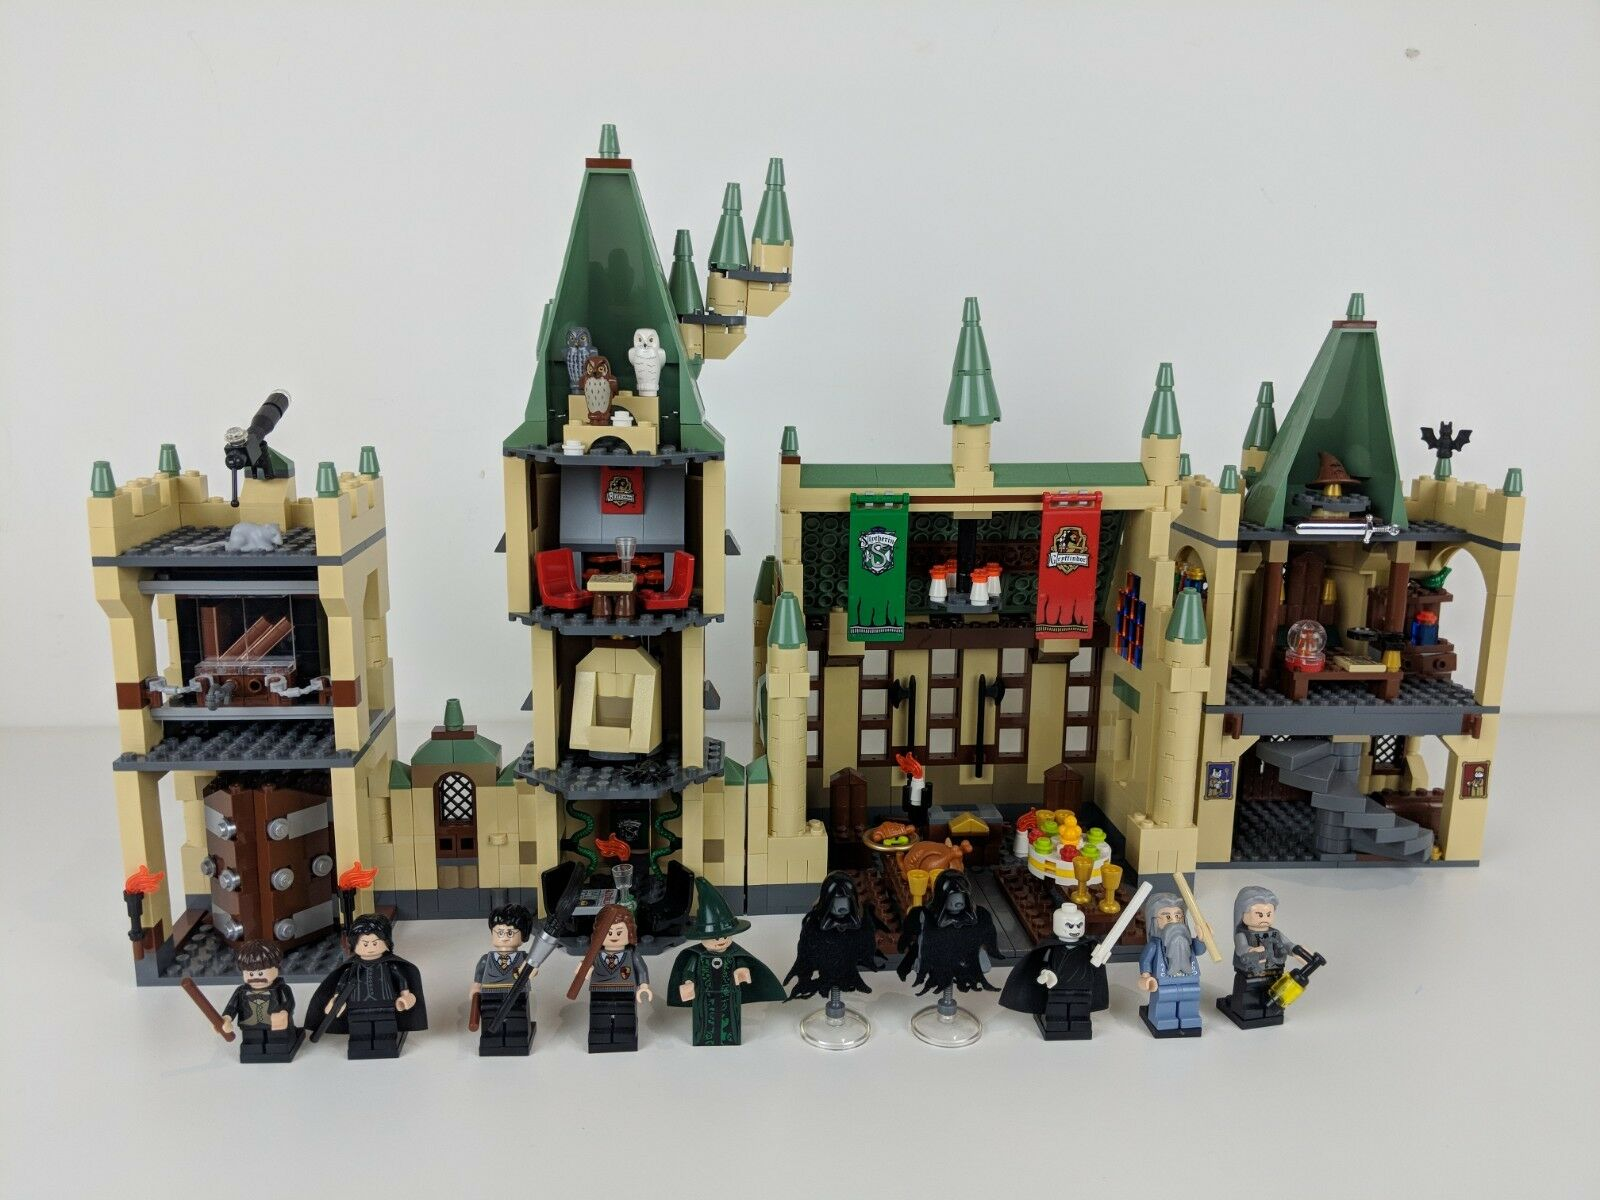 Harry Potter LEGO 4842 4867 Castello di Hogwarts Set  2010  Minifigures e Accessori